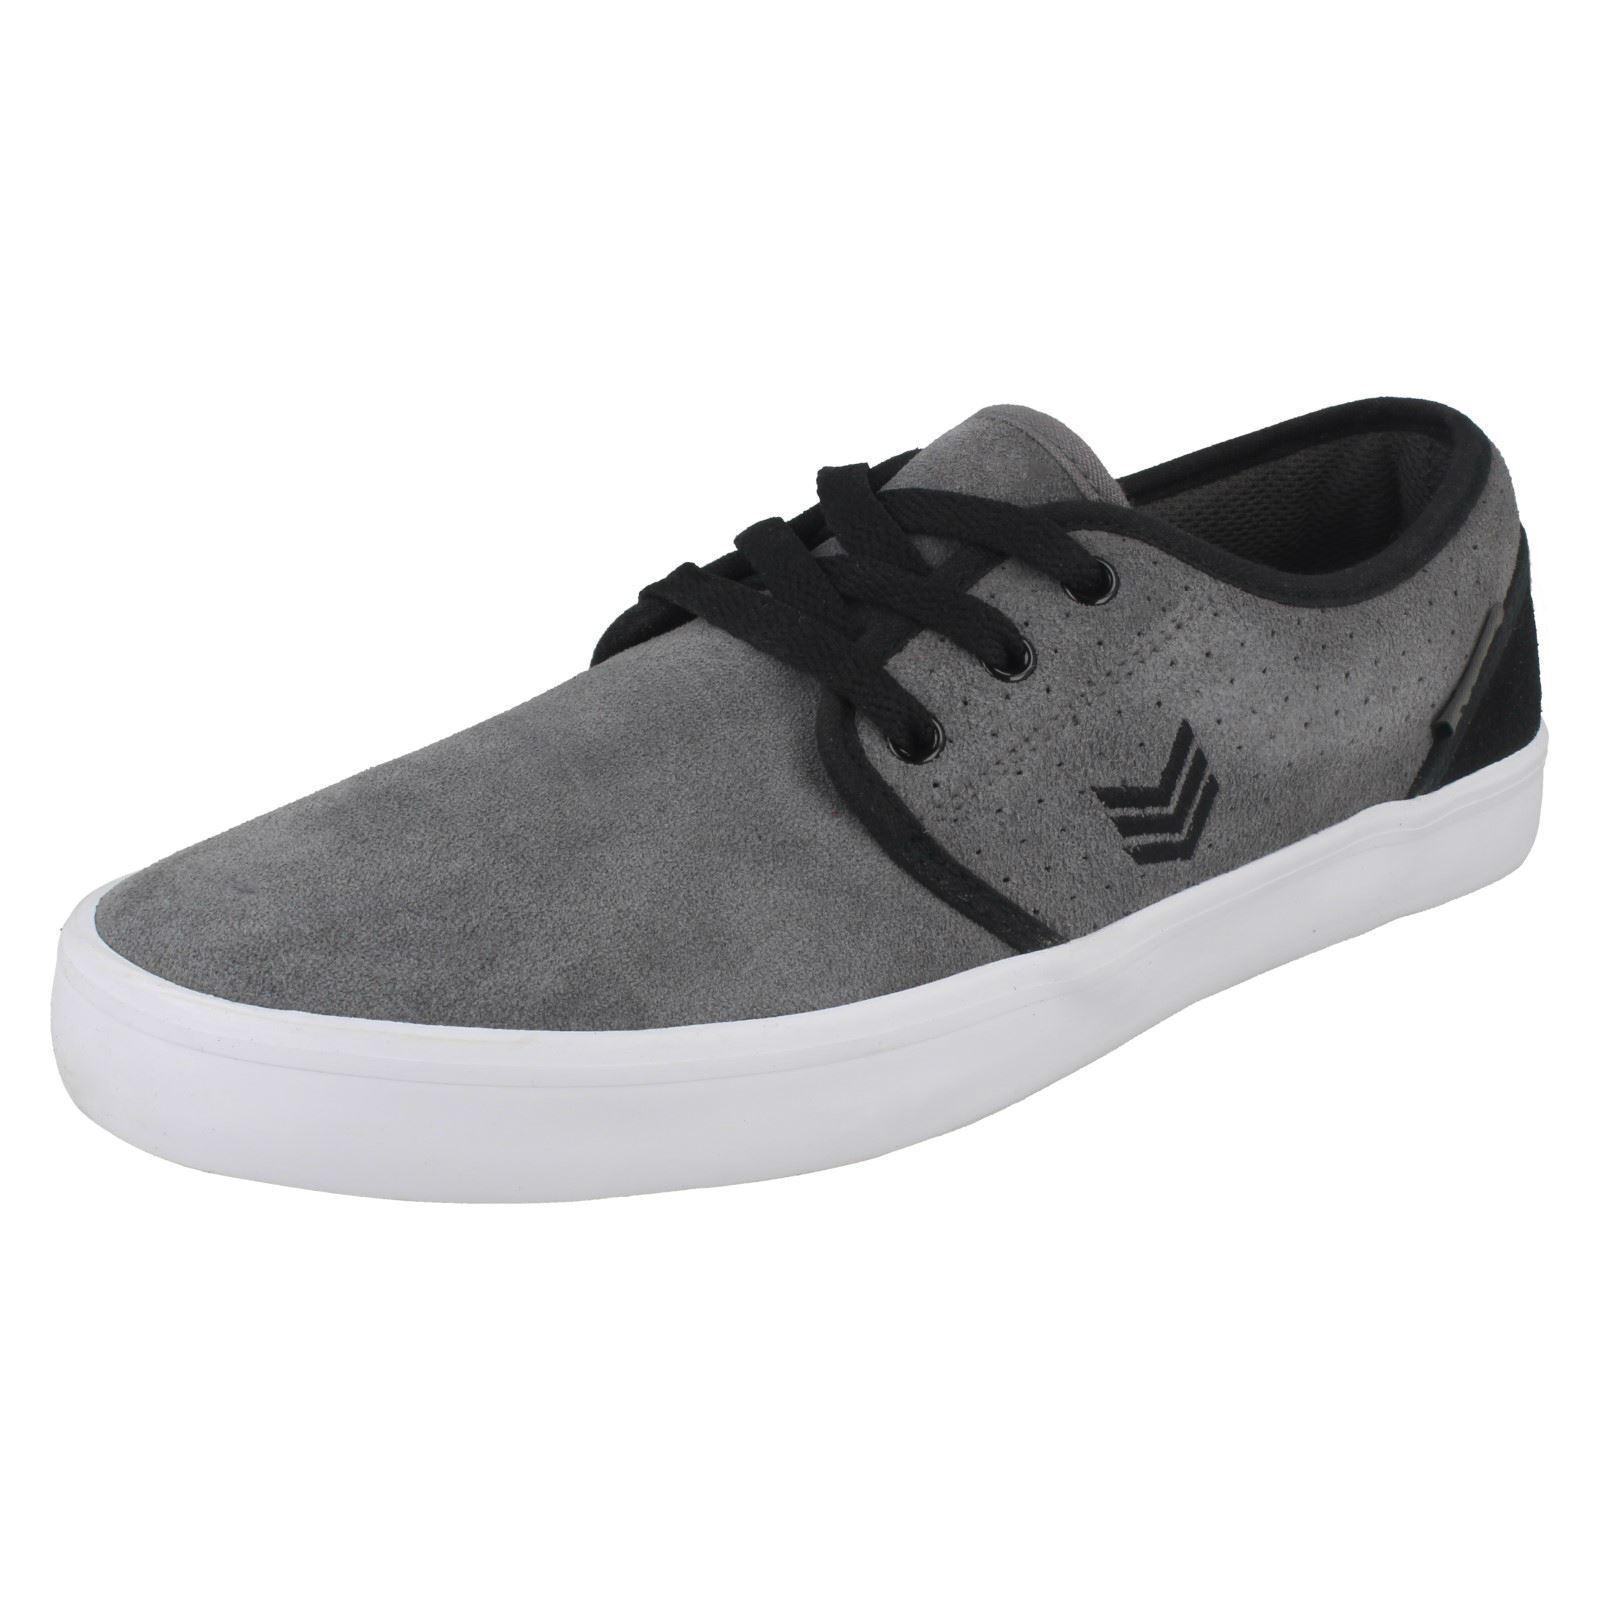 Mens Vox Footwear Inc Casual Shoes 'Slacker'